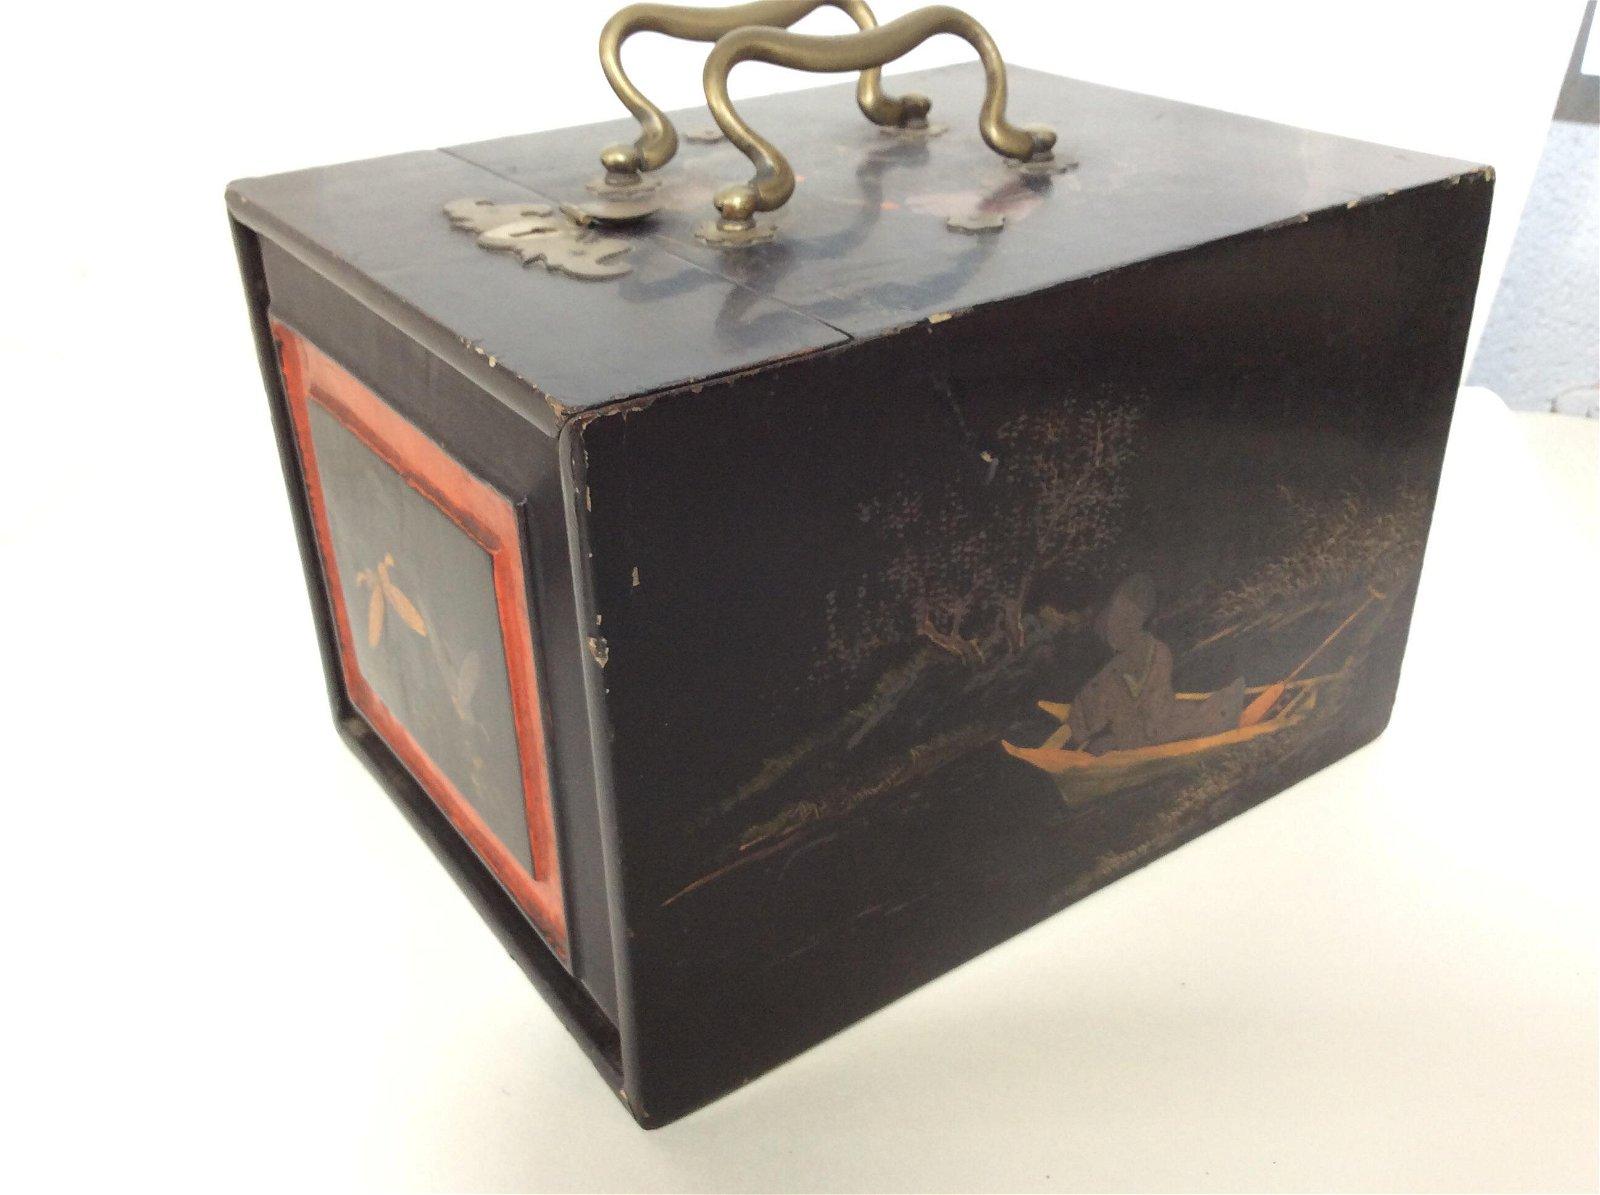 Vintage Asian Nesting Vanity Box, Jewelry